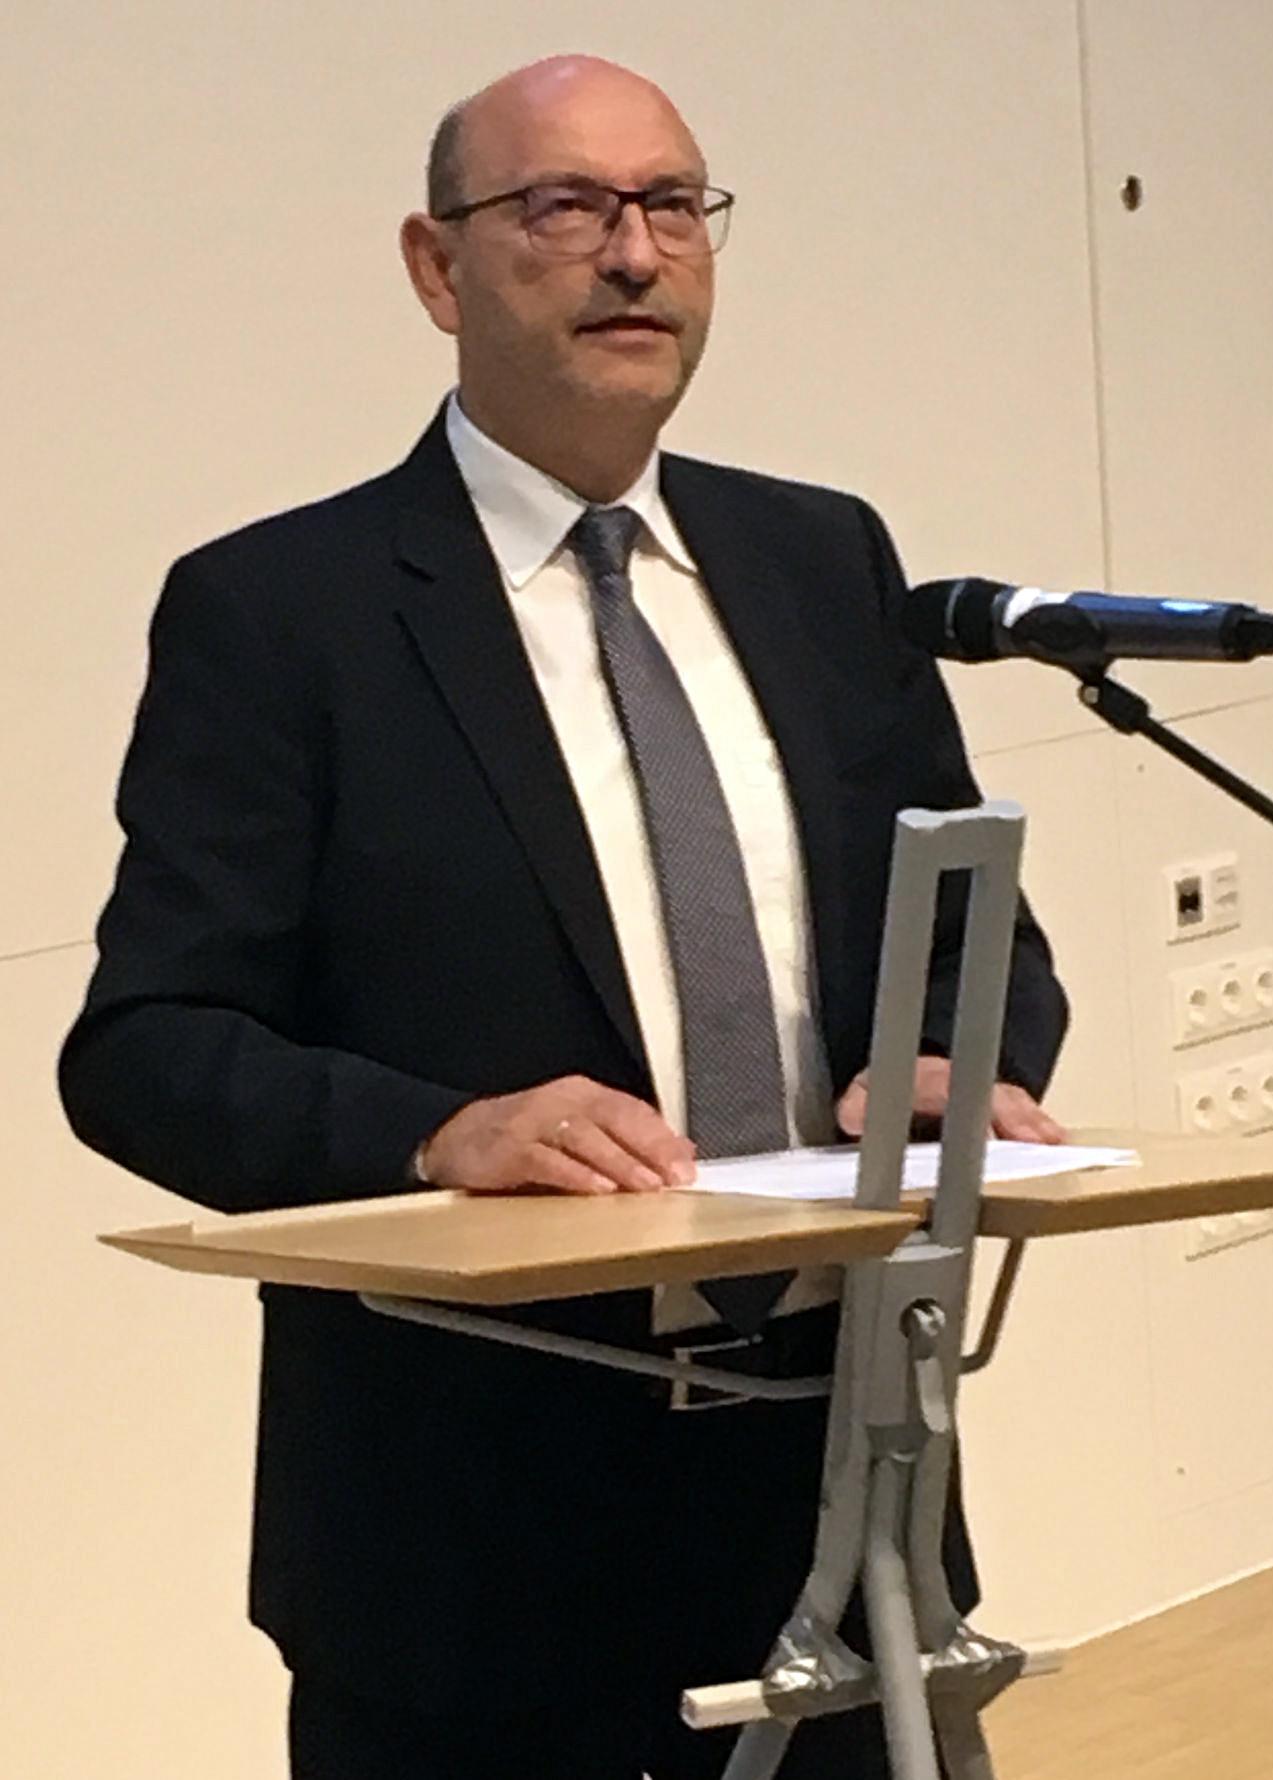 Norbert Kraker